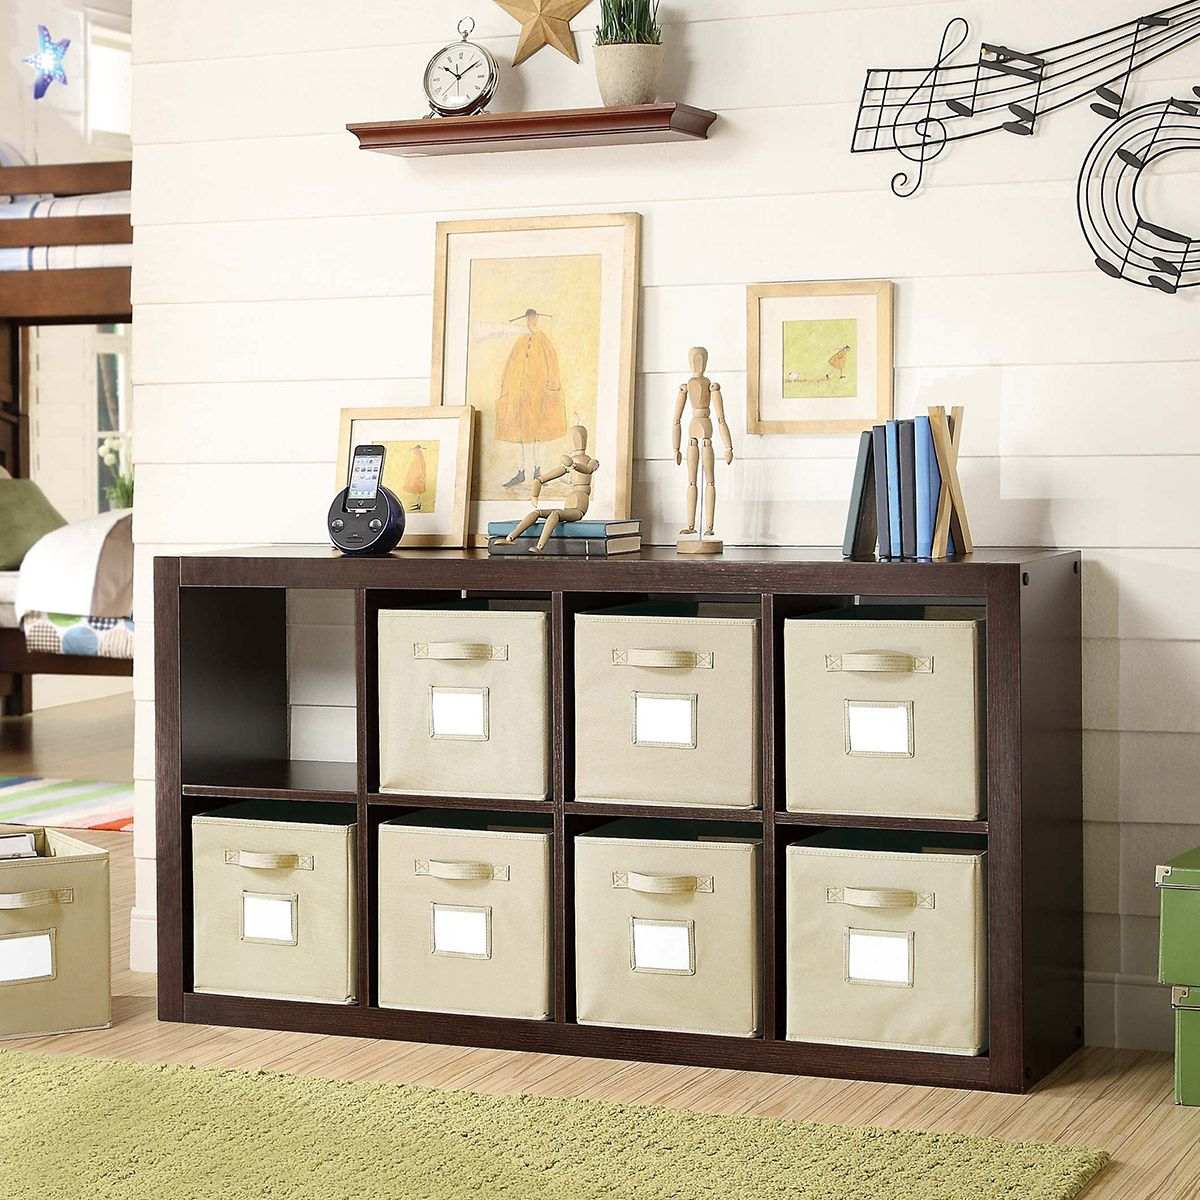 8 Cream Storage Bins Wood Mdf Pb Construction With Roast Hazelnut Melamine Arrange Vertically Or Horizontally Ideal For Bayside Furnishings Room Divider Room